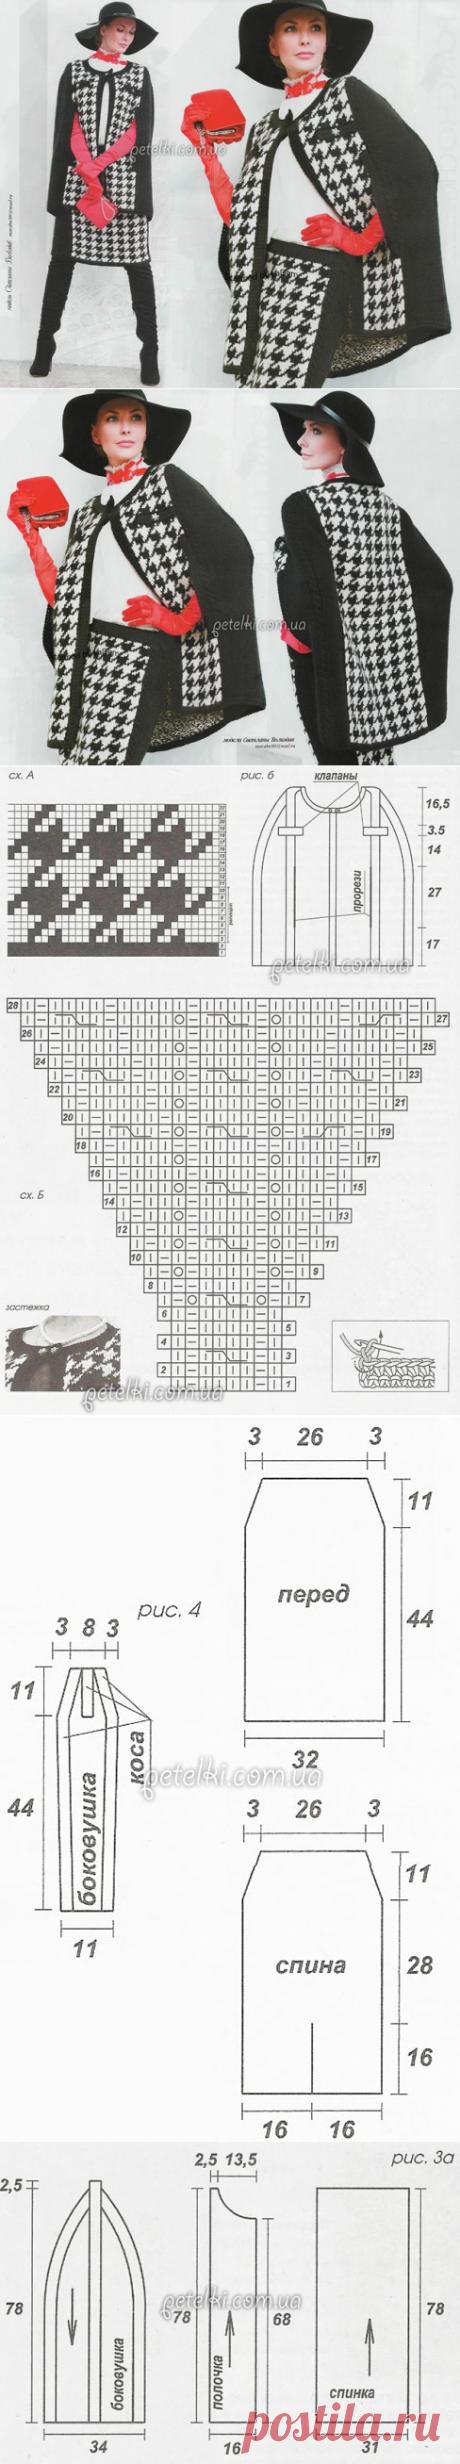 Keyp and a skirt a jacquard pattern from Svetlana Volkodav. Schemes, description of knitting